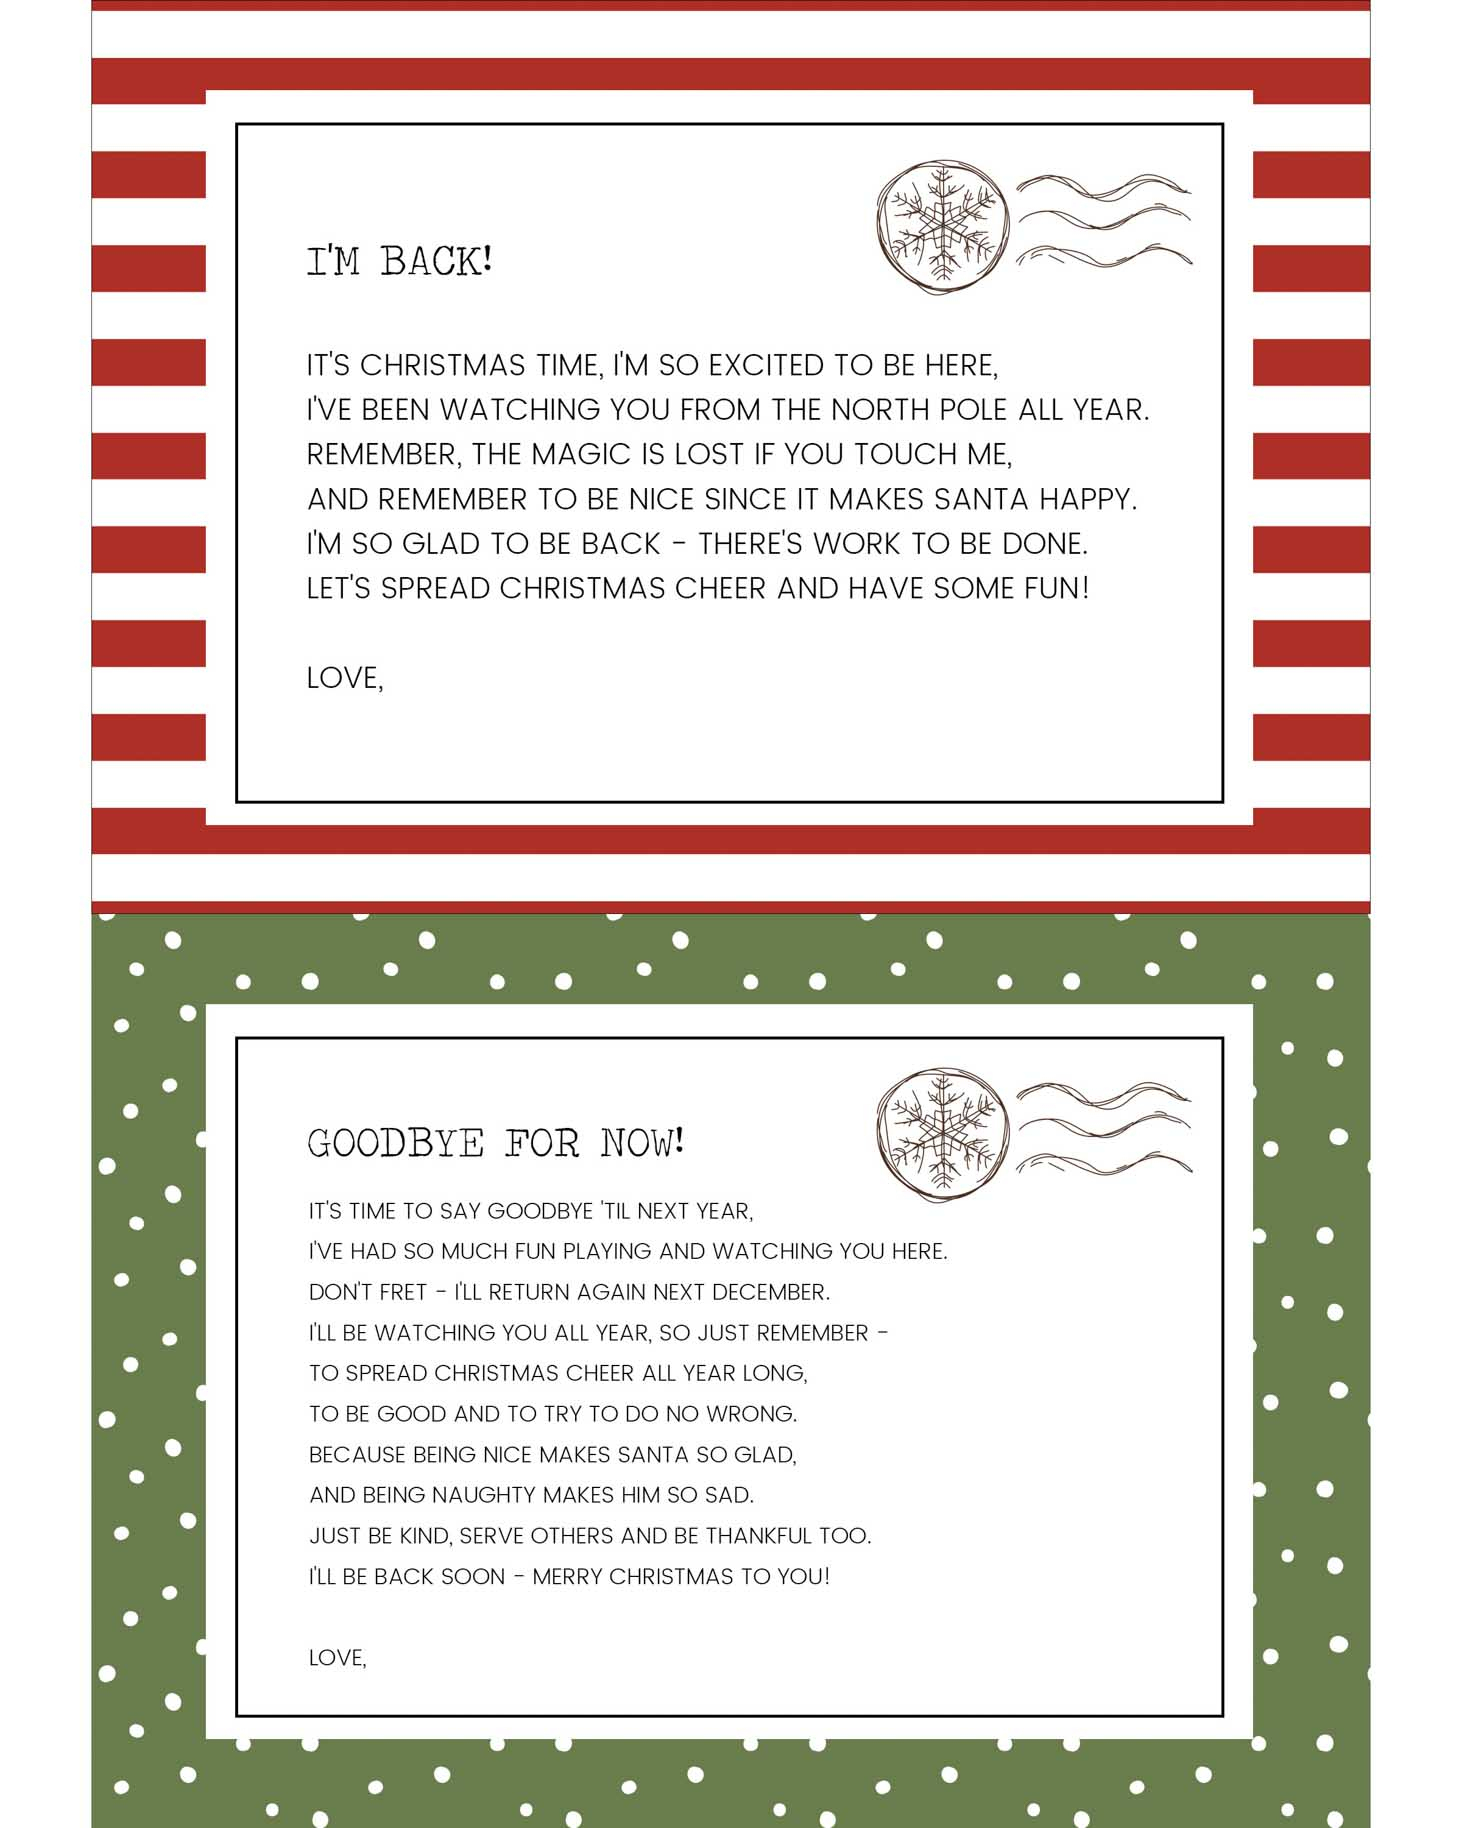 Funny Elf On The Shelf Ideas + Free Printables   Lil' Luna - Elf On The Shelf Goodbye Letter Free Printable